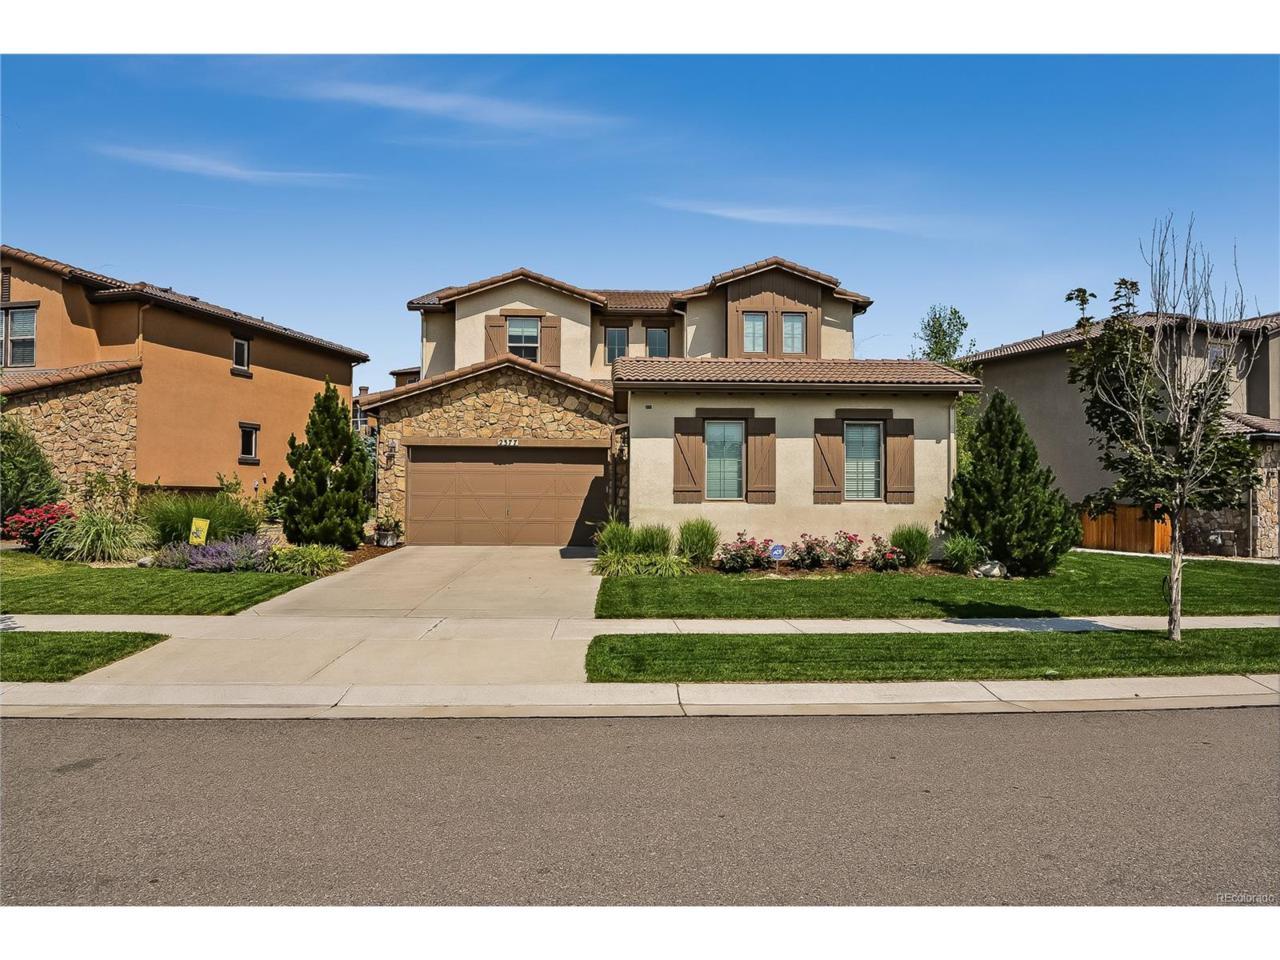 2377 S Loveland Street, Lakewood, CO 80228 (MLS #3767003) :: 8z Real Estate